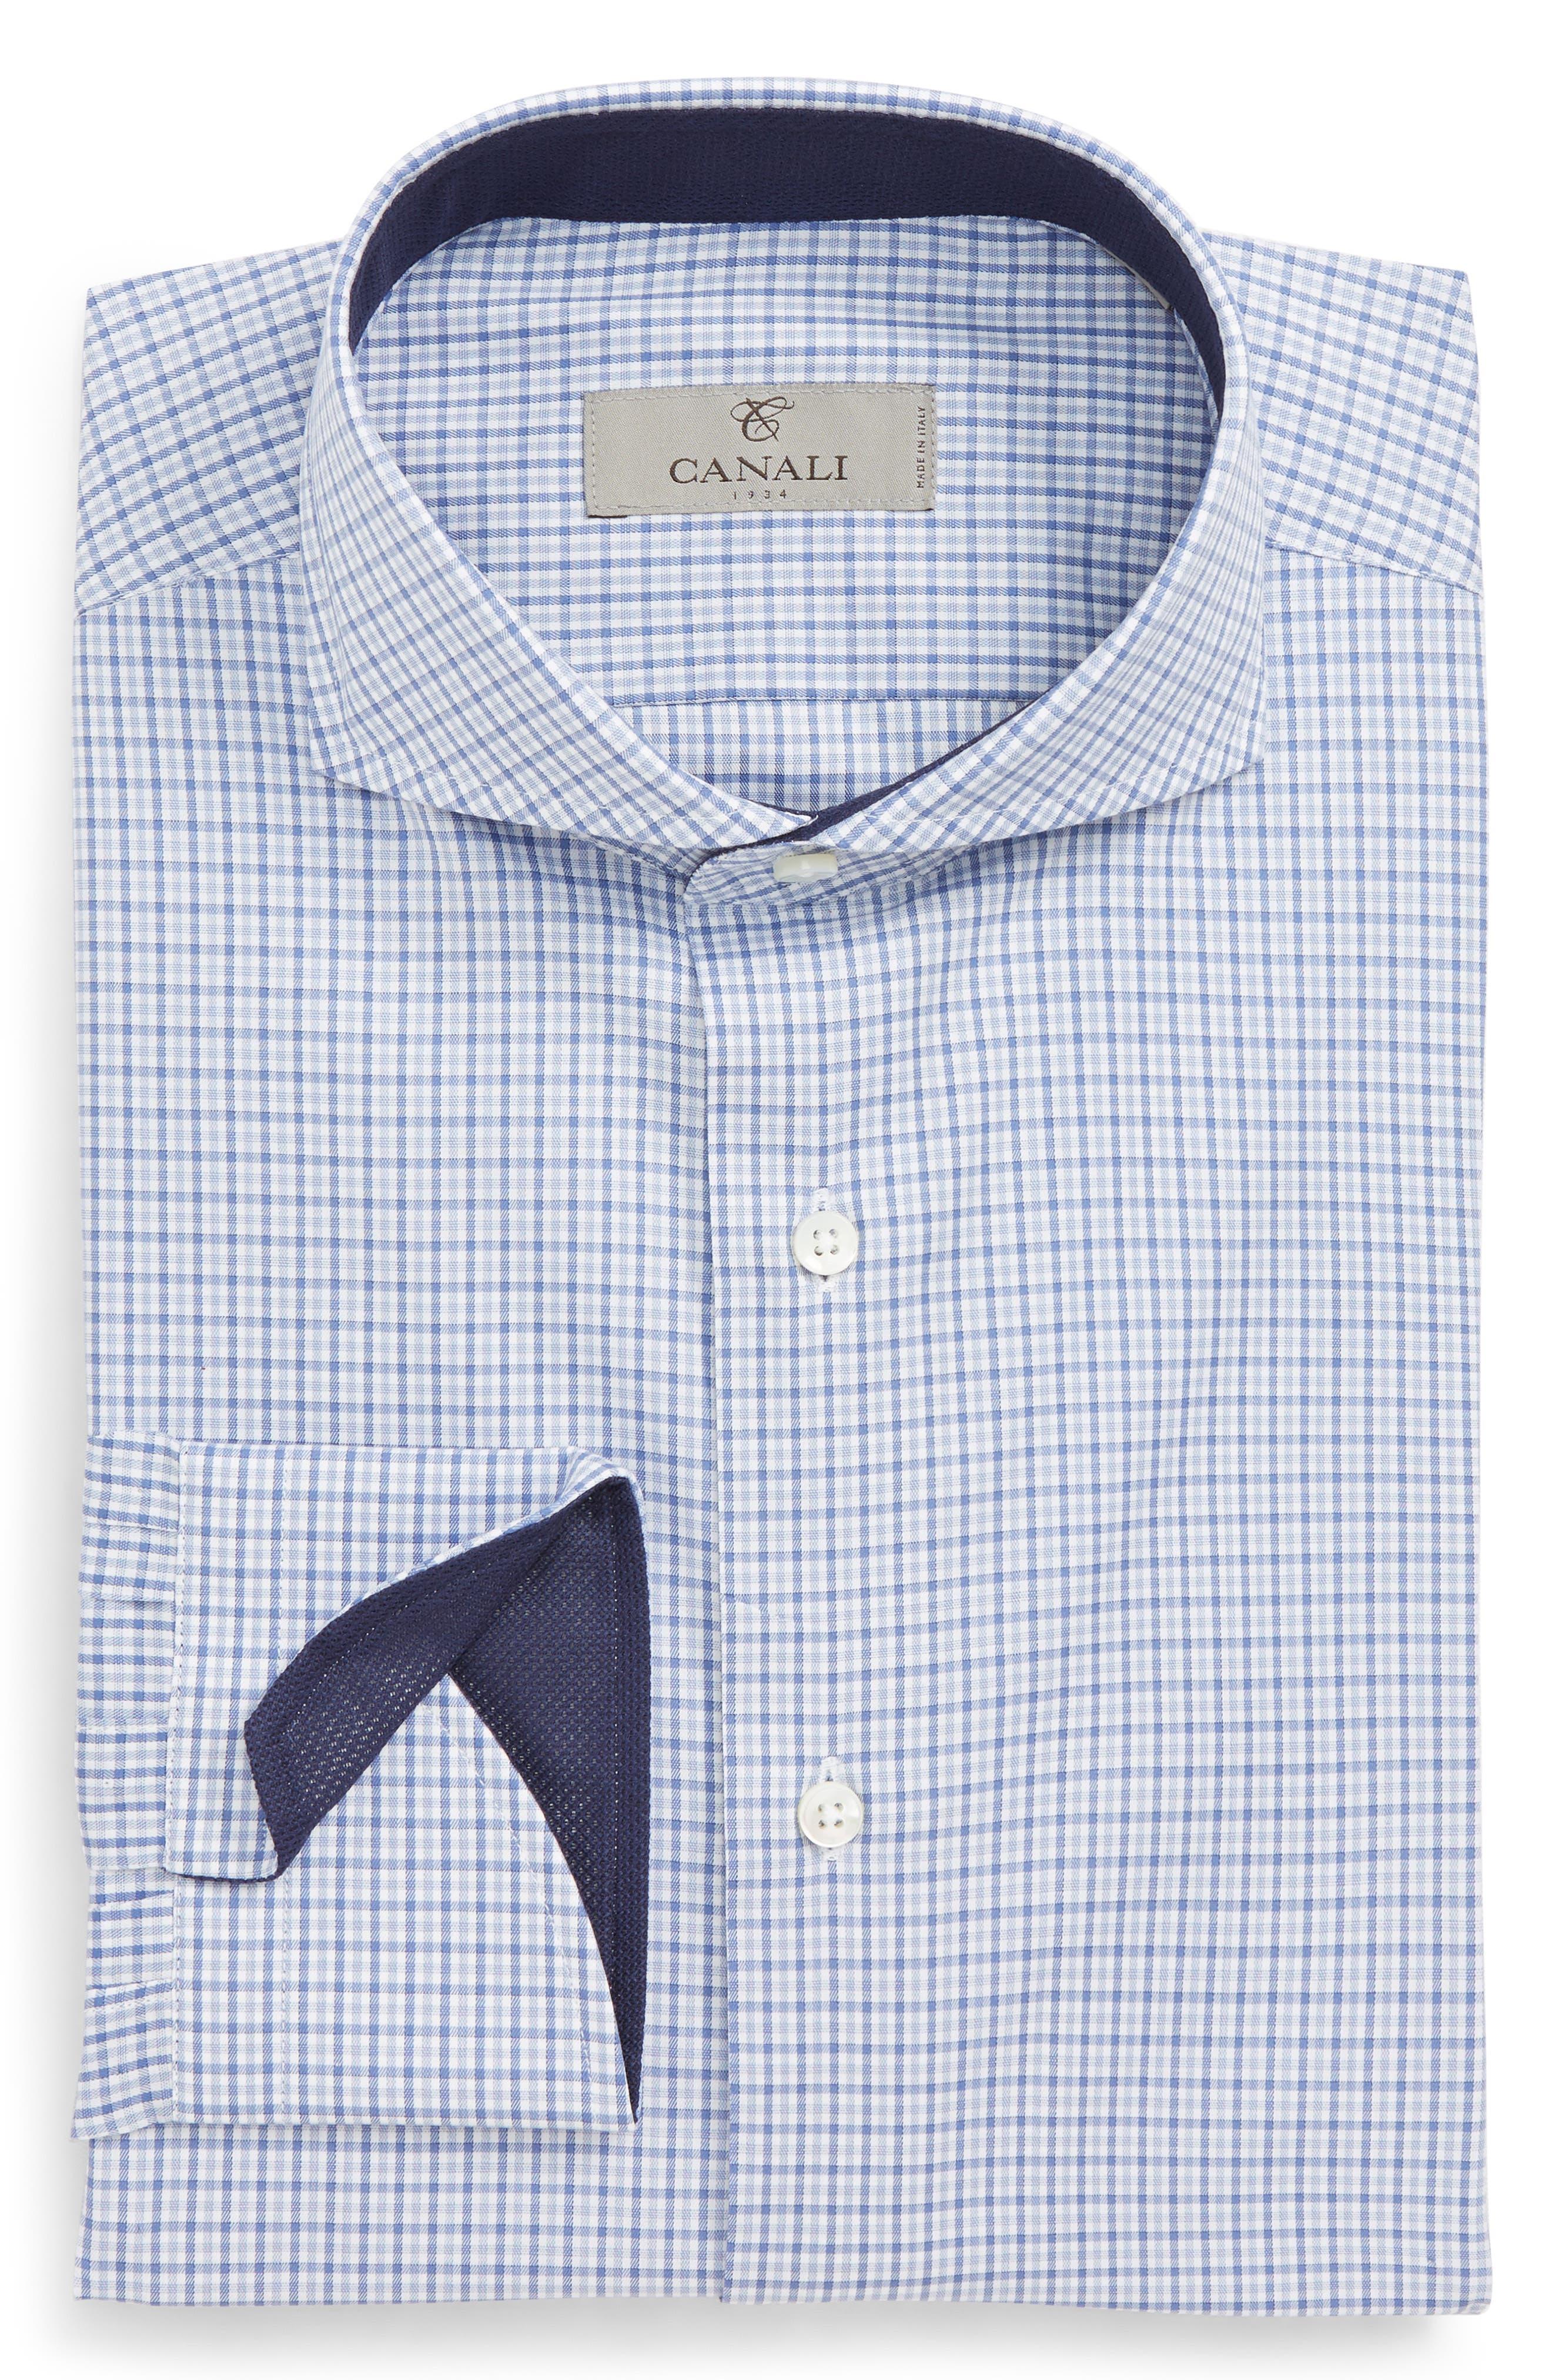 Regular Fit Check Dress Shirt,                             Alternate thumbnail 5, color,                             420